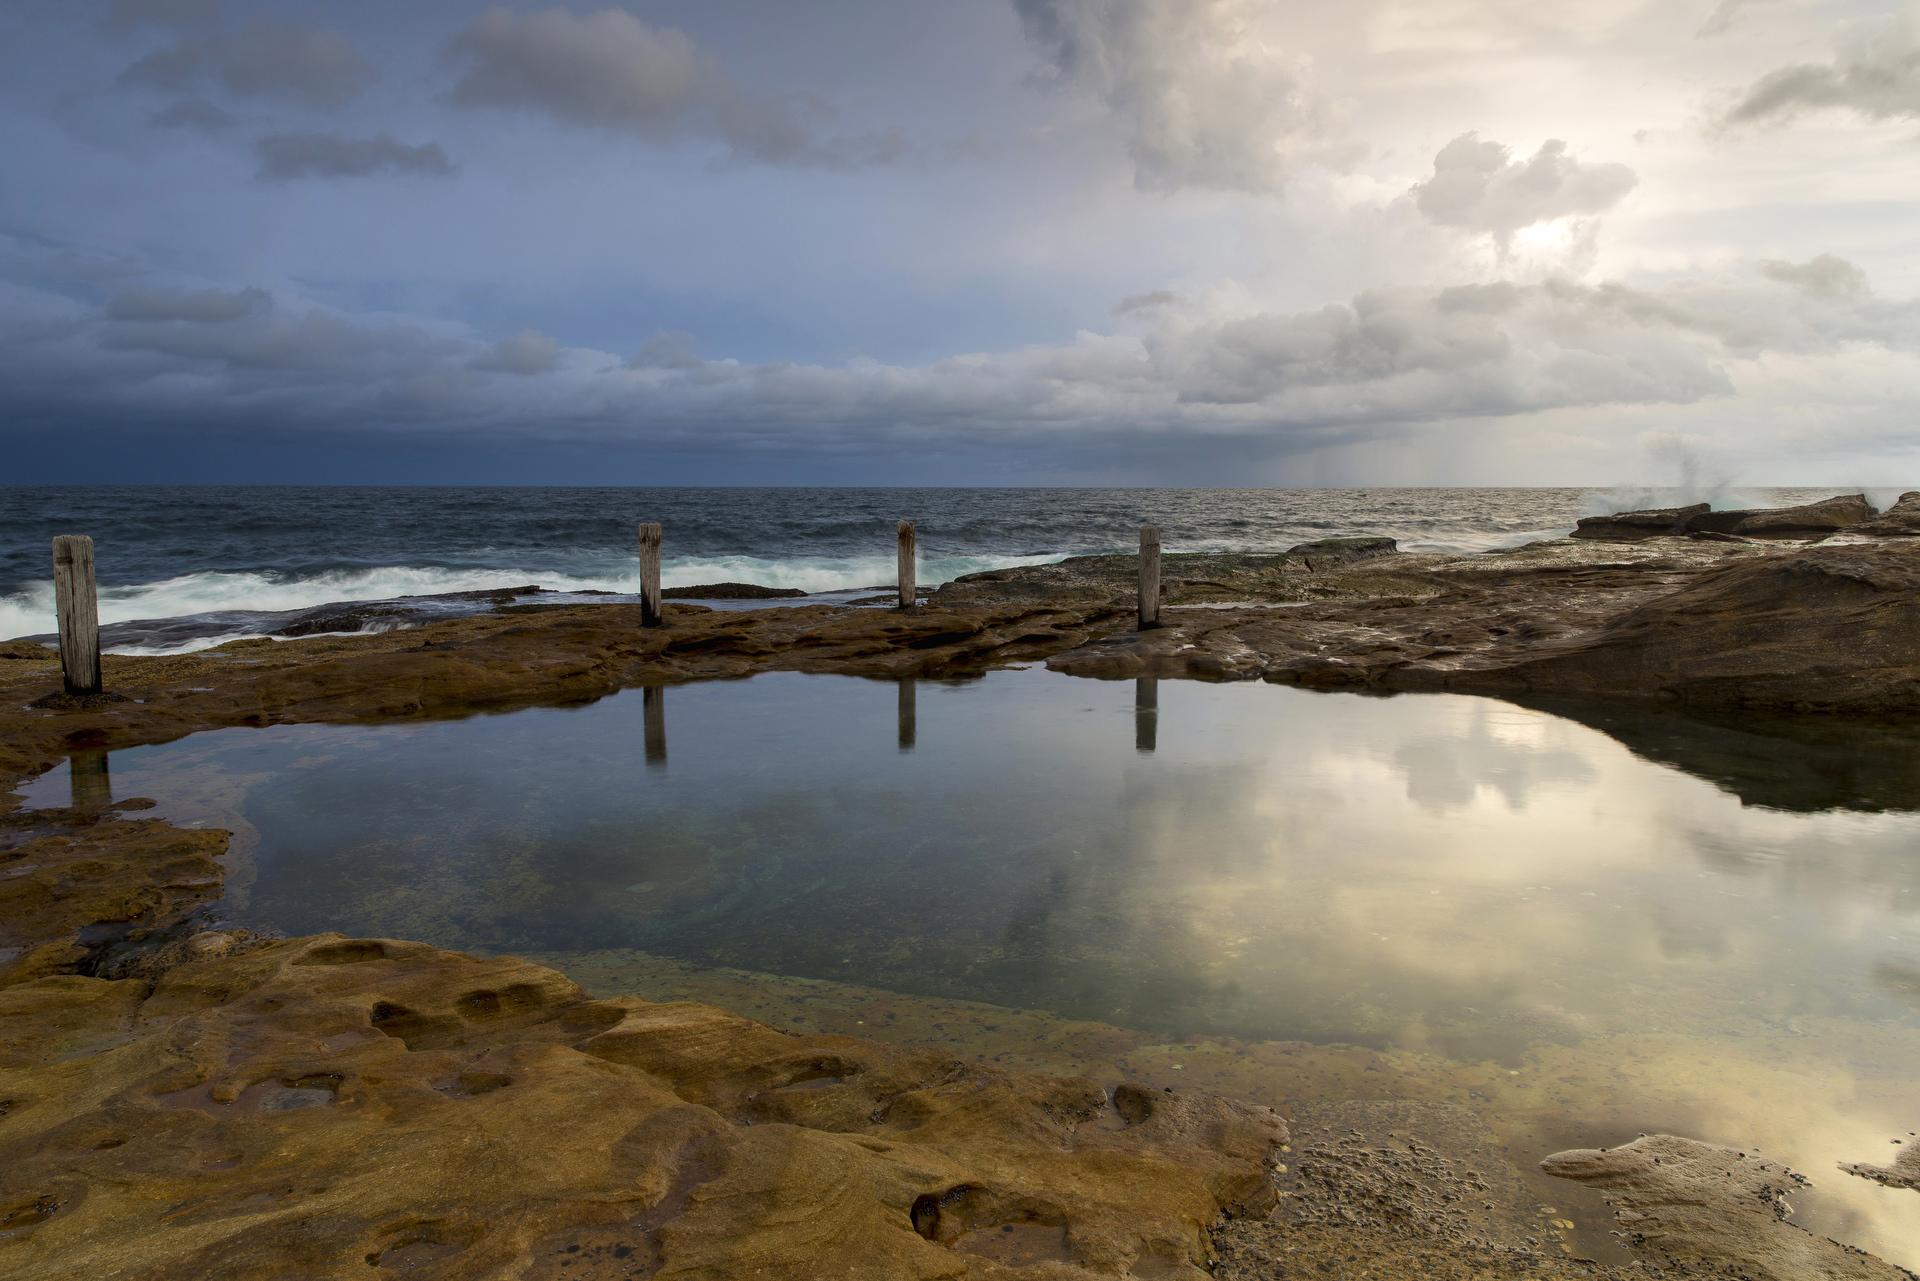 Sydney landscape photographer, sunrise, sunset, ocean, ocean pool, landscape, award winning, travel, NSW, Australia, sea, fine art prints, While you were sleeping, coogee